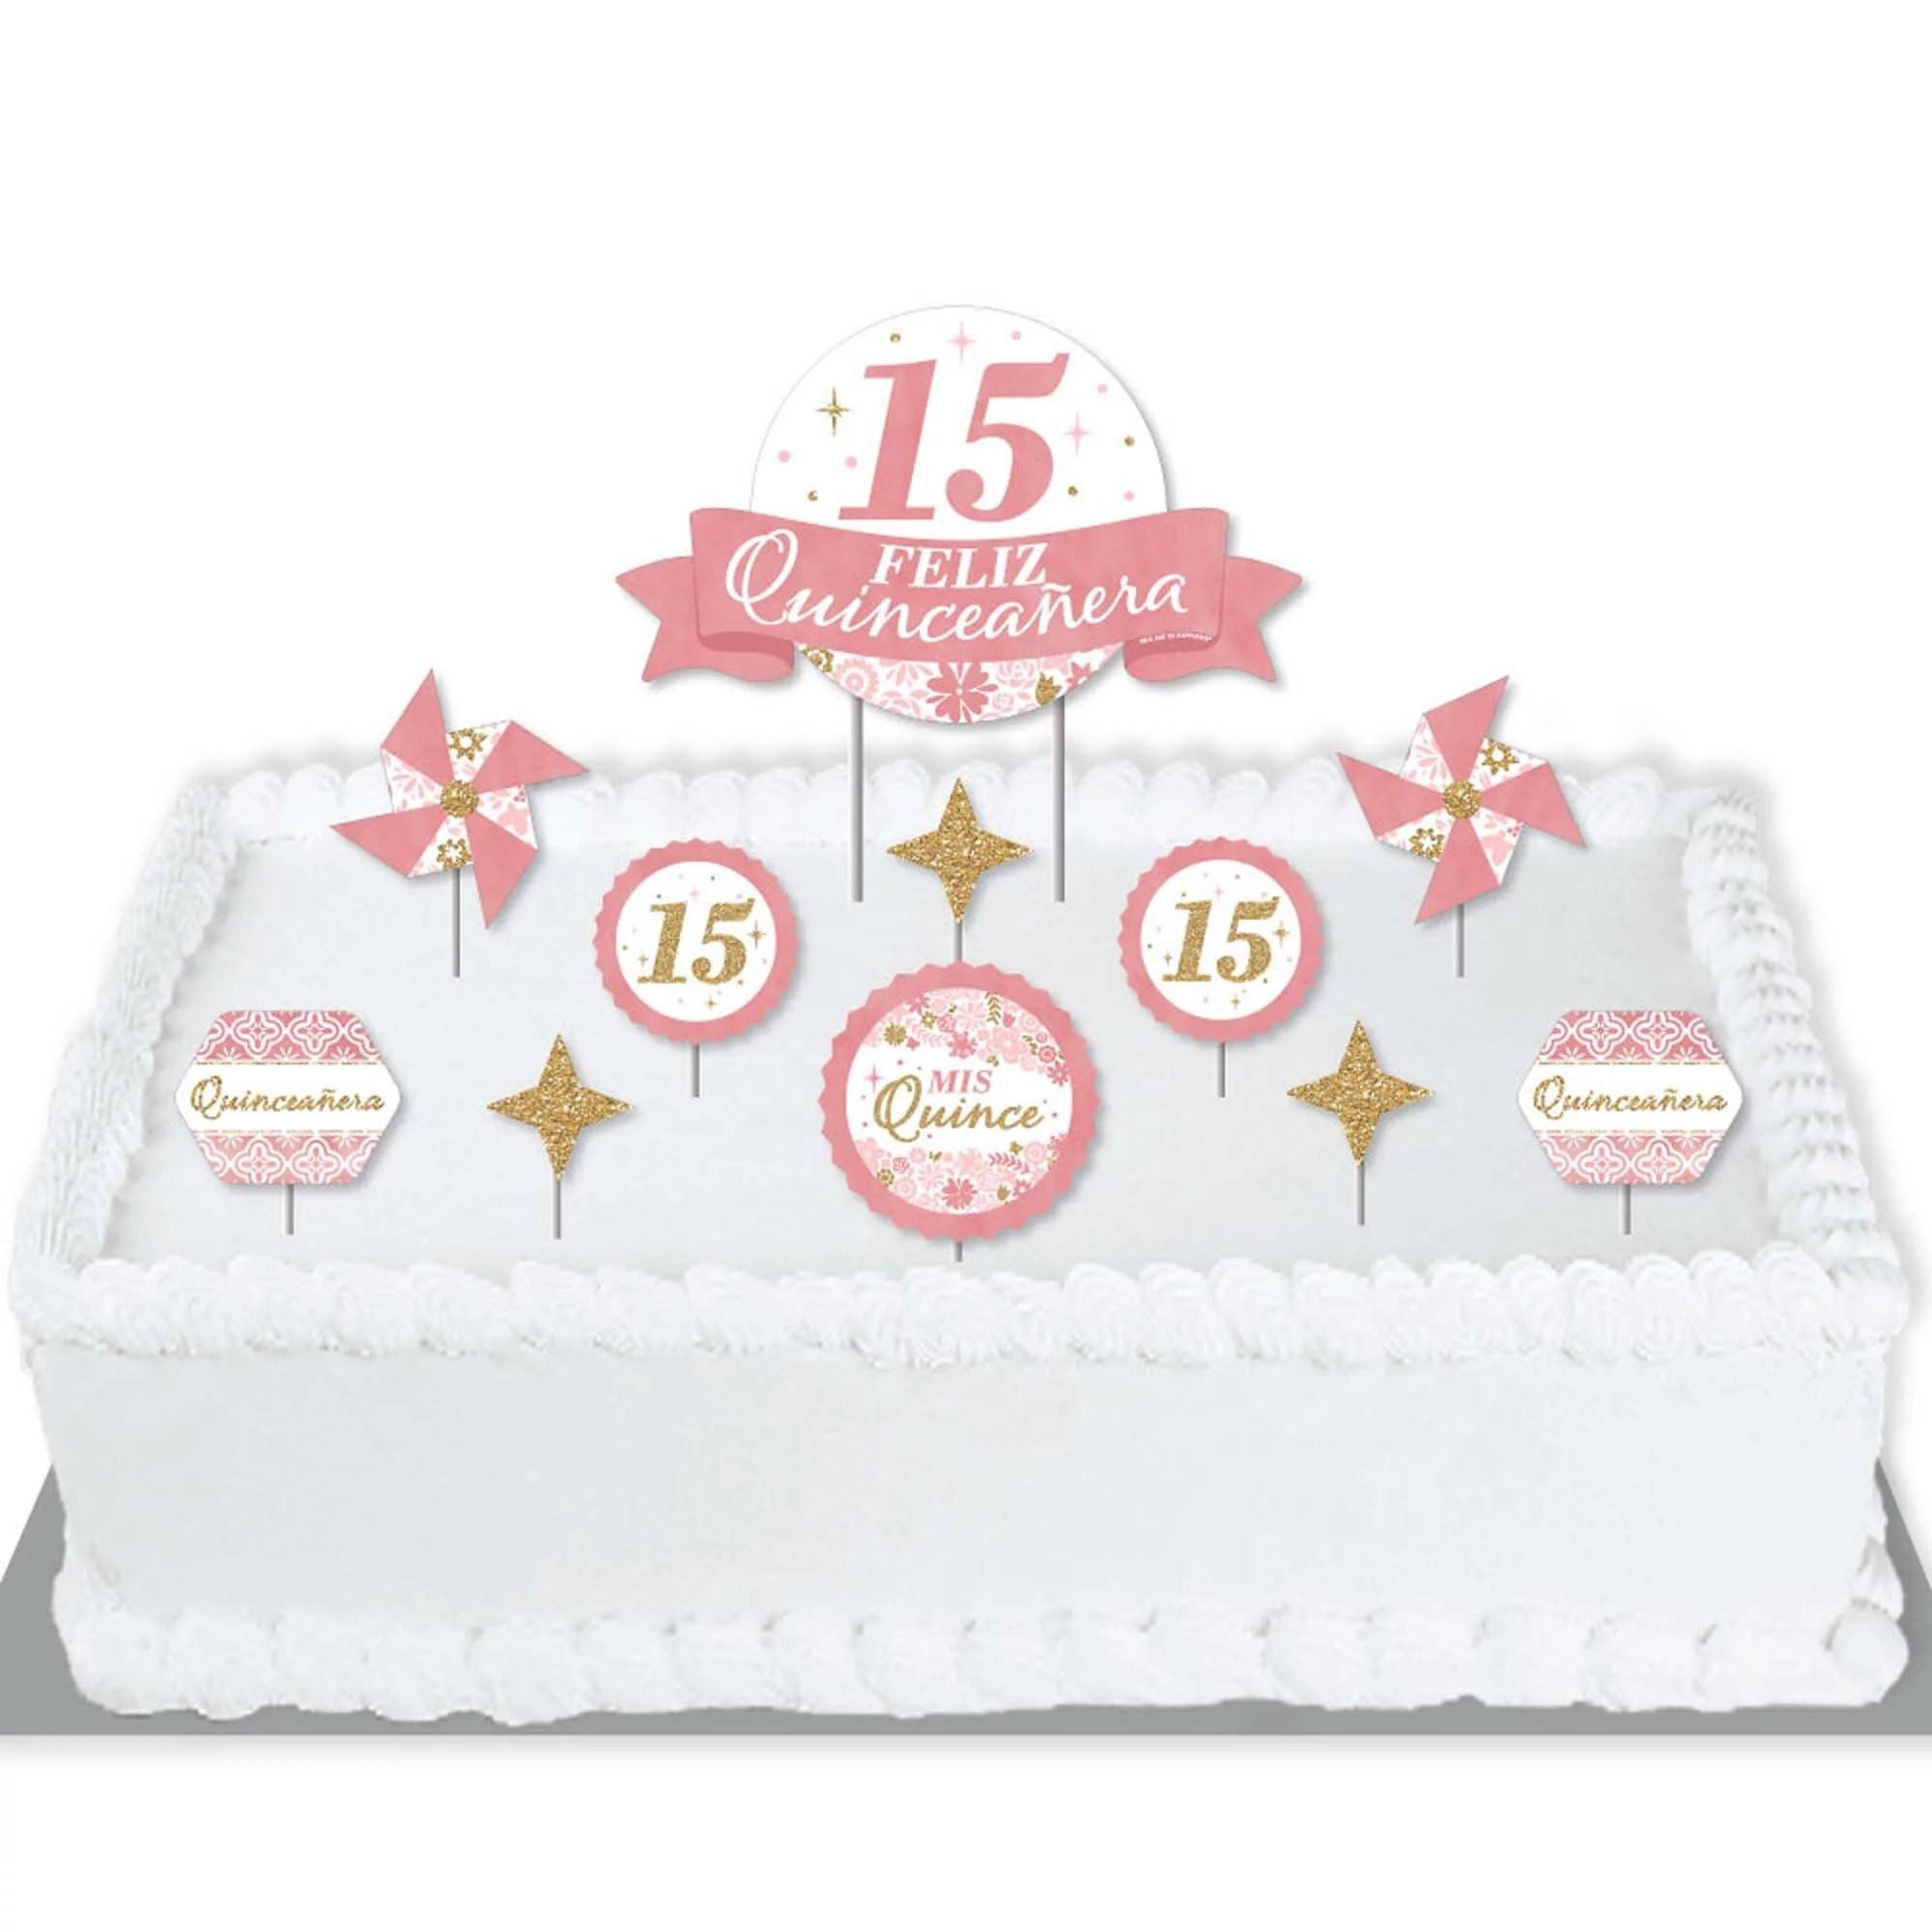 Mis Quince Anos Quinceanera Sweet 15 Birthday Party Cake Decorating Kit Feliz Quinceanera Cake Topper Set 11 Pieces Walmart Com Walmart Com